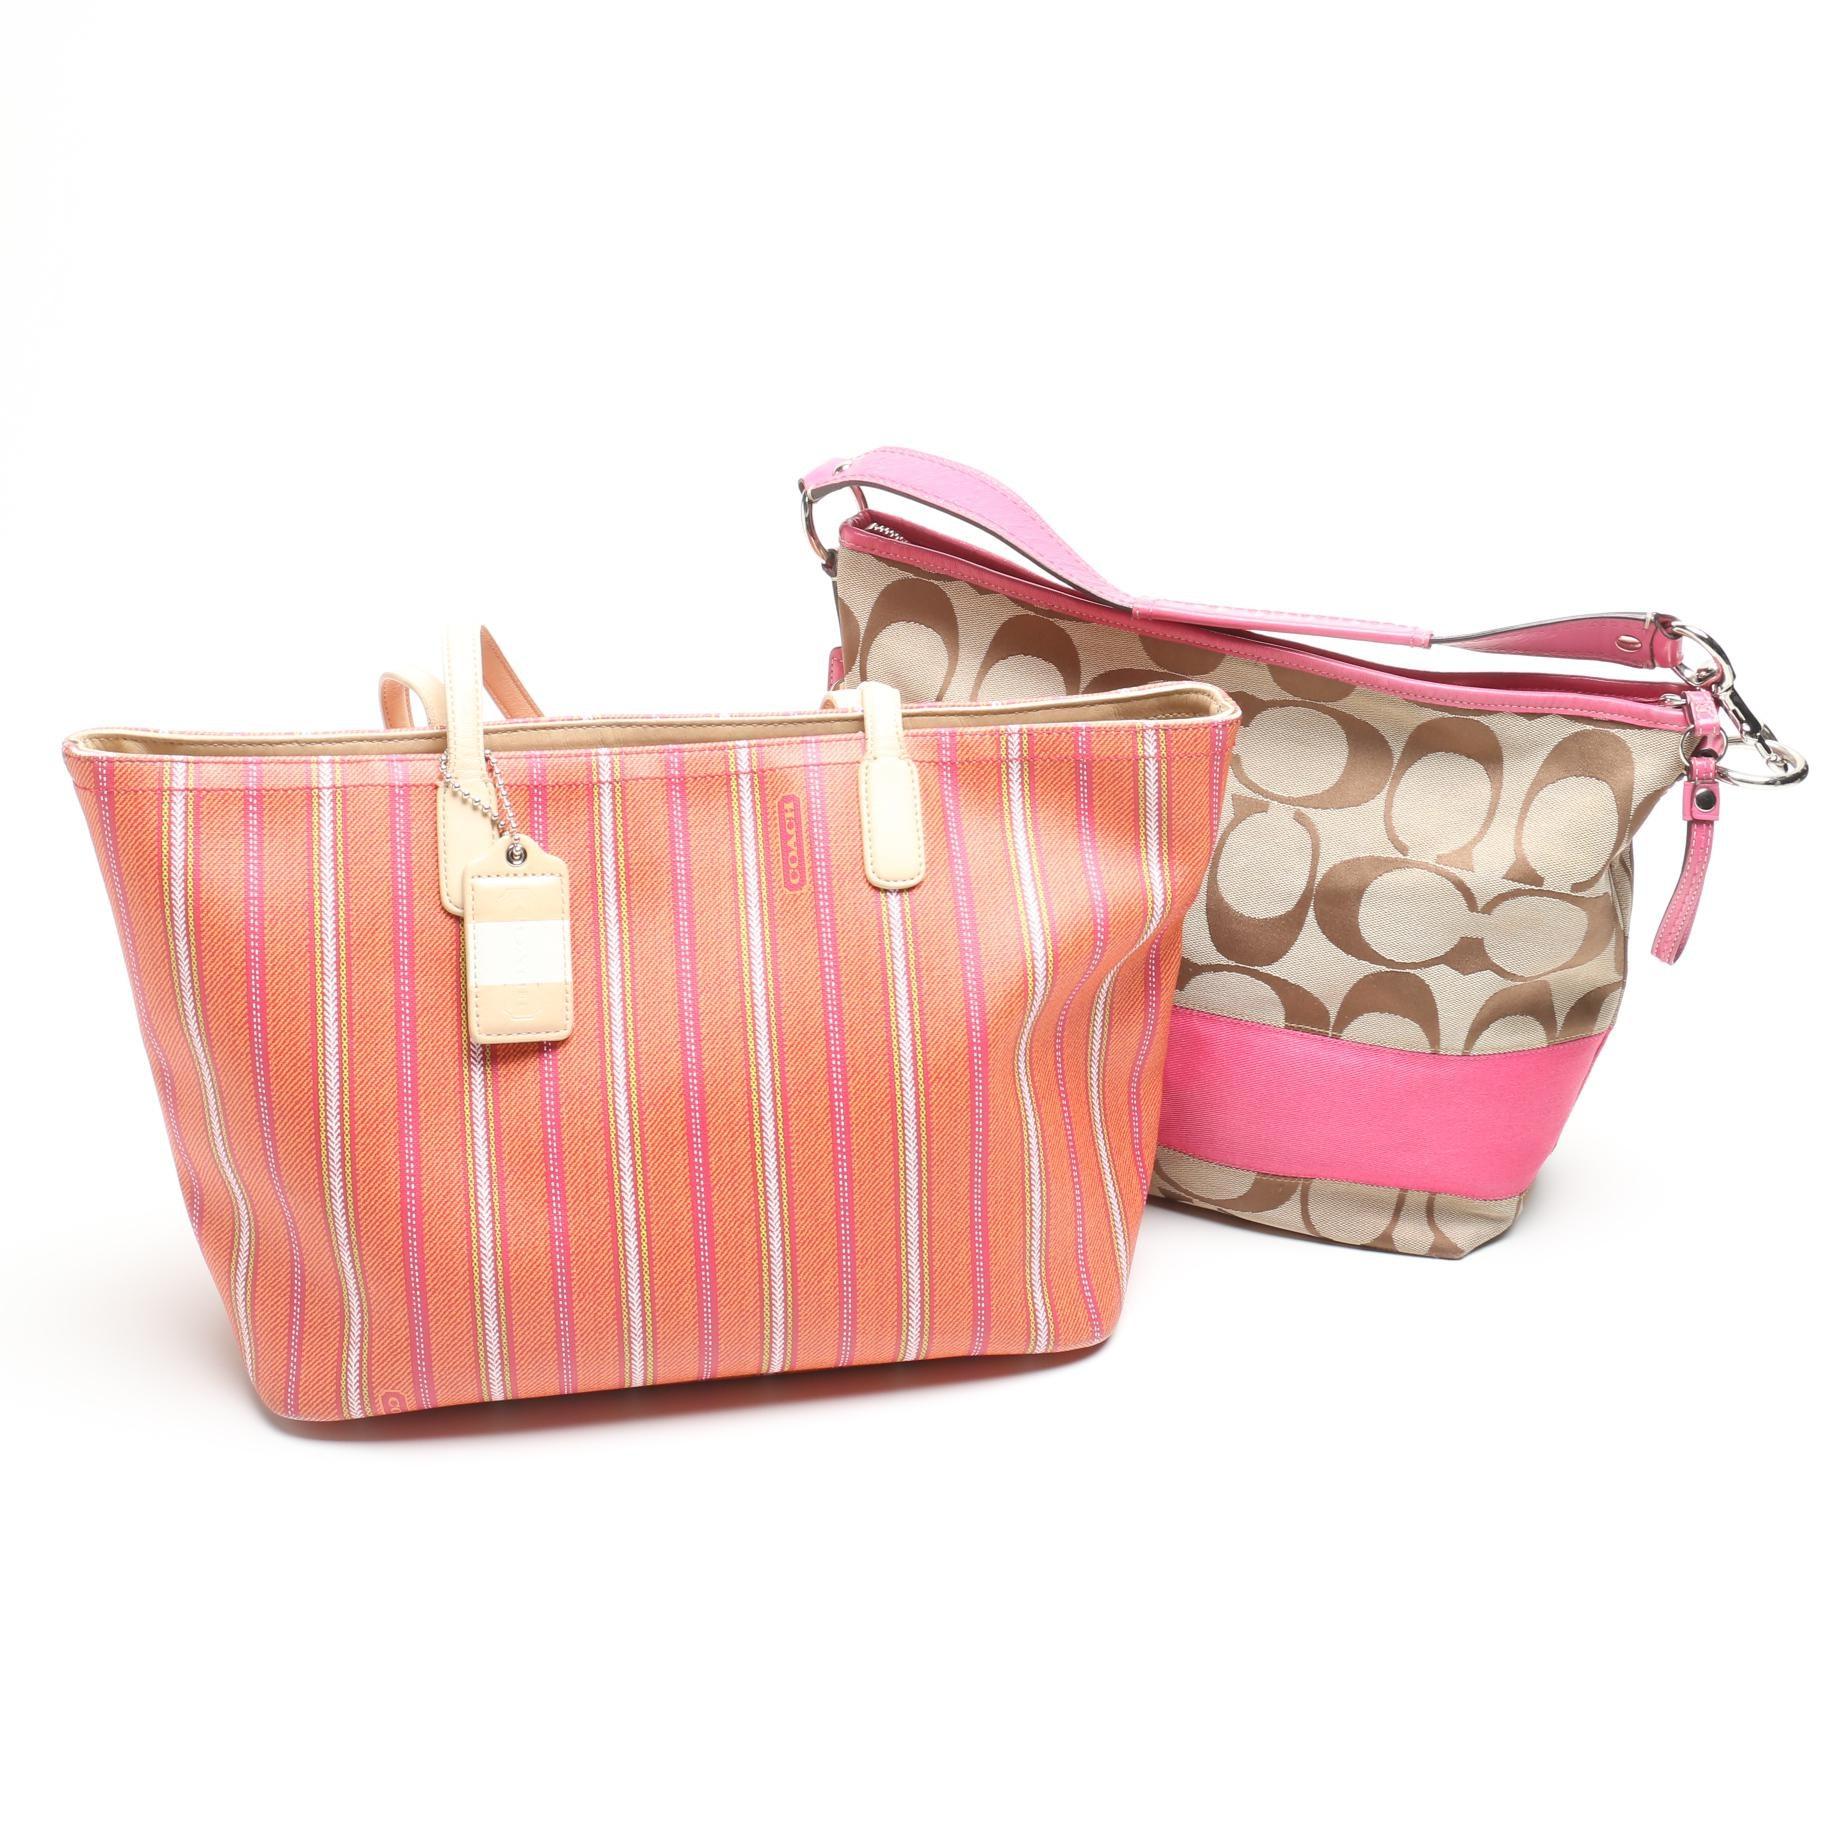 Coach Legacy Weekend Ticking Stripe Tote Bag and Signature Stripe Shoulder Bag